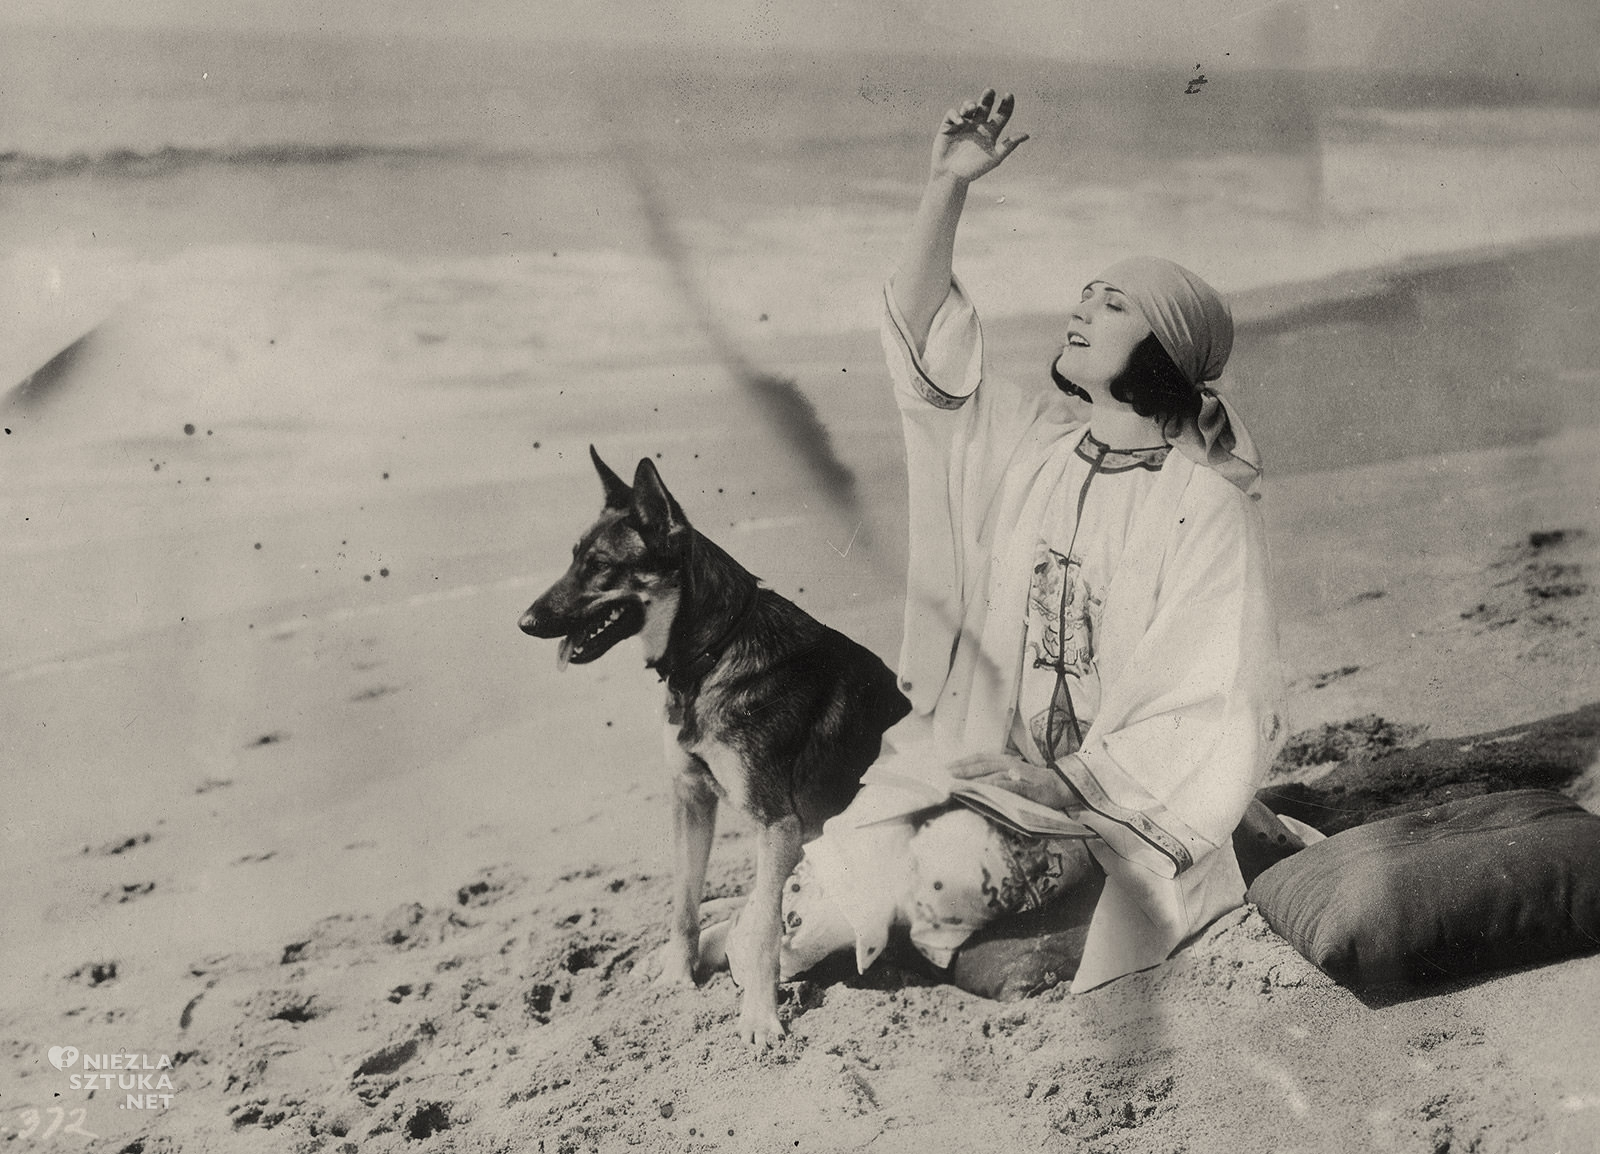 Pola Negri, fotografia, aktorka, kino, pies, Niezła Sztuka